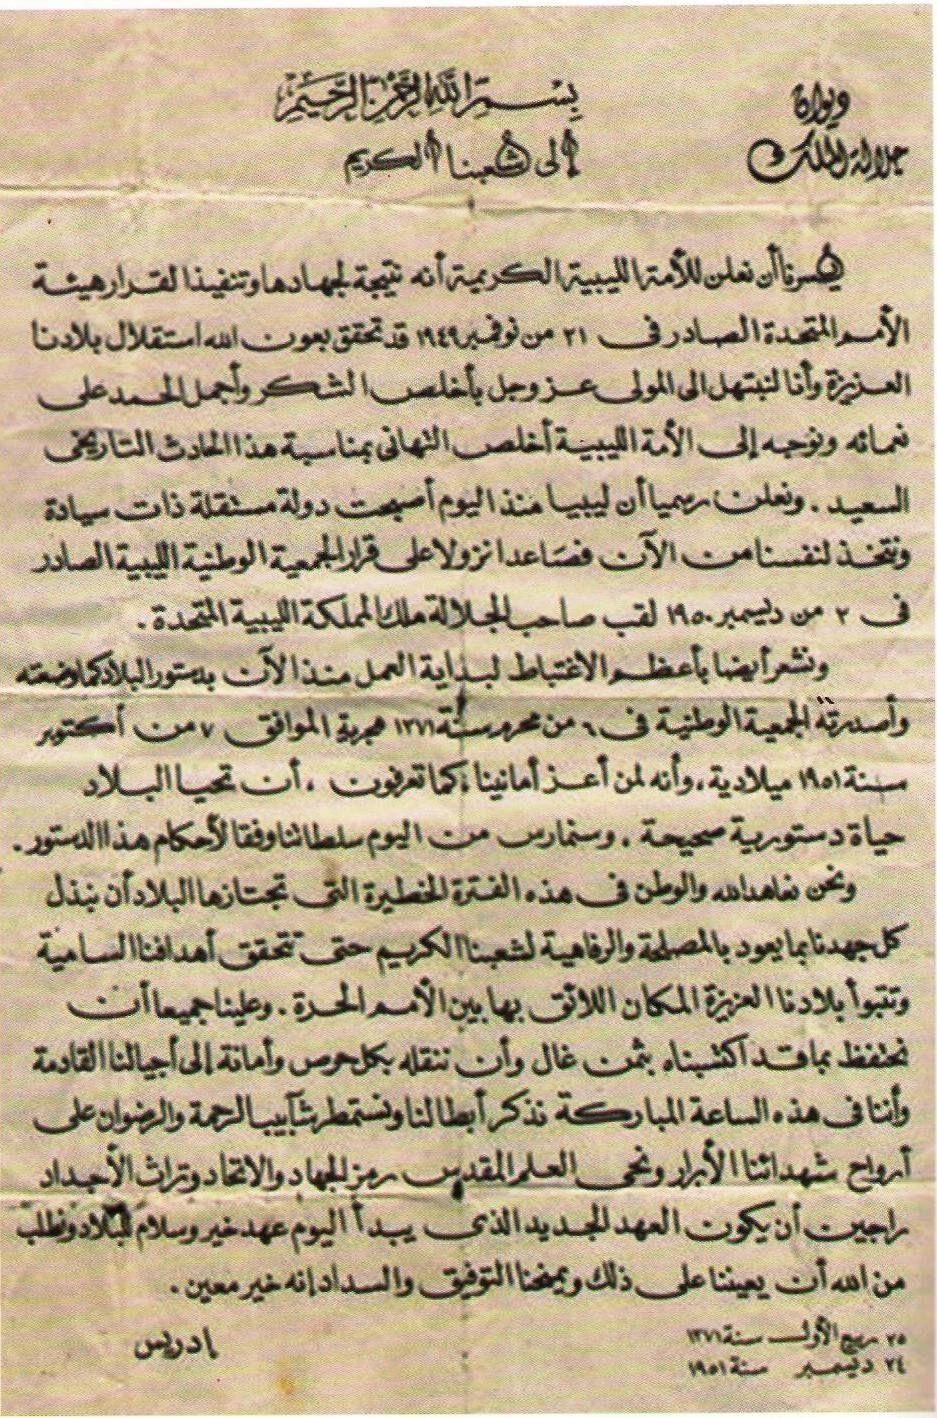 King Idris Al Sanusi S Speech In Which He Declared That The United Kingdom Of Libya Day December 24 1951 خطاب الملك إدريس السن History Libya Leader